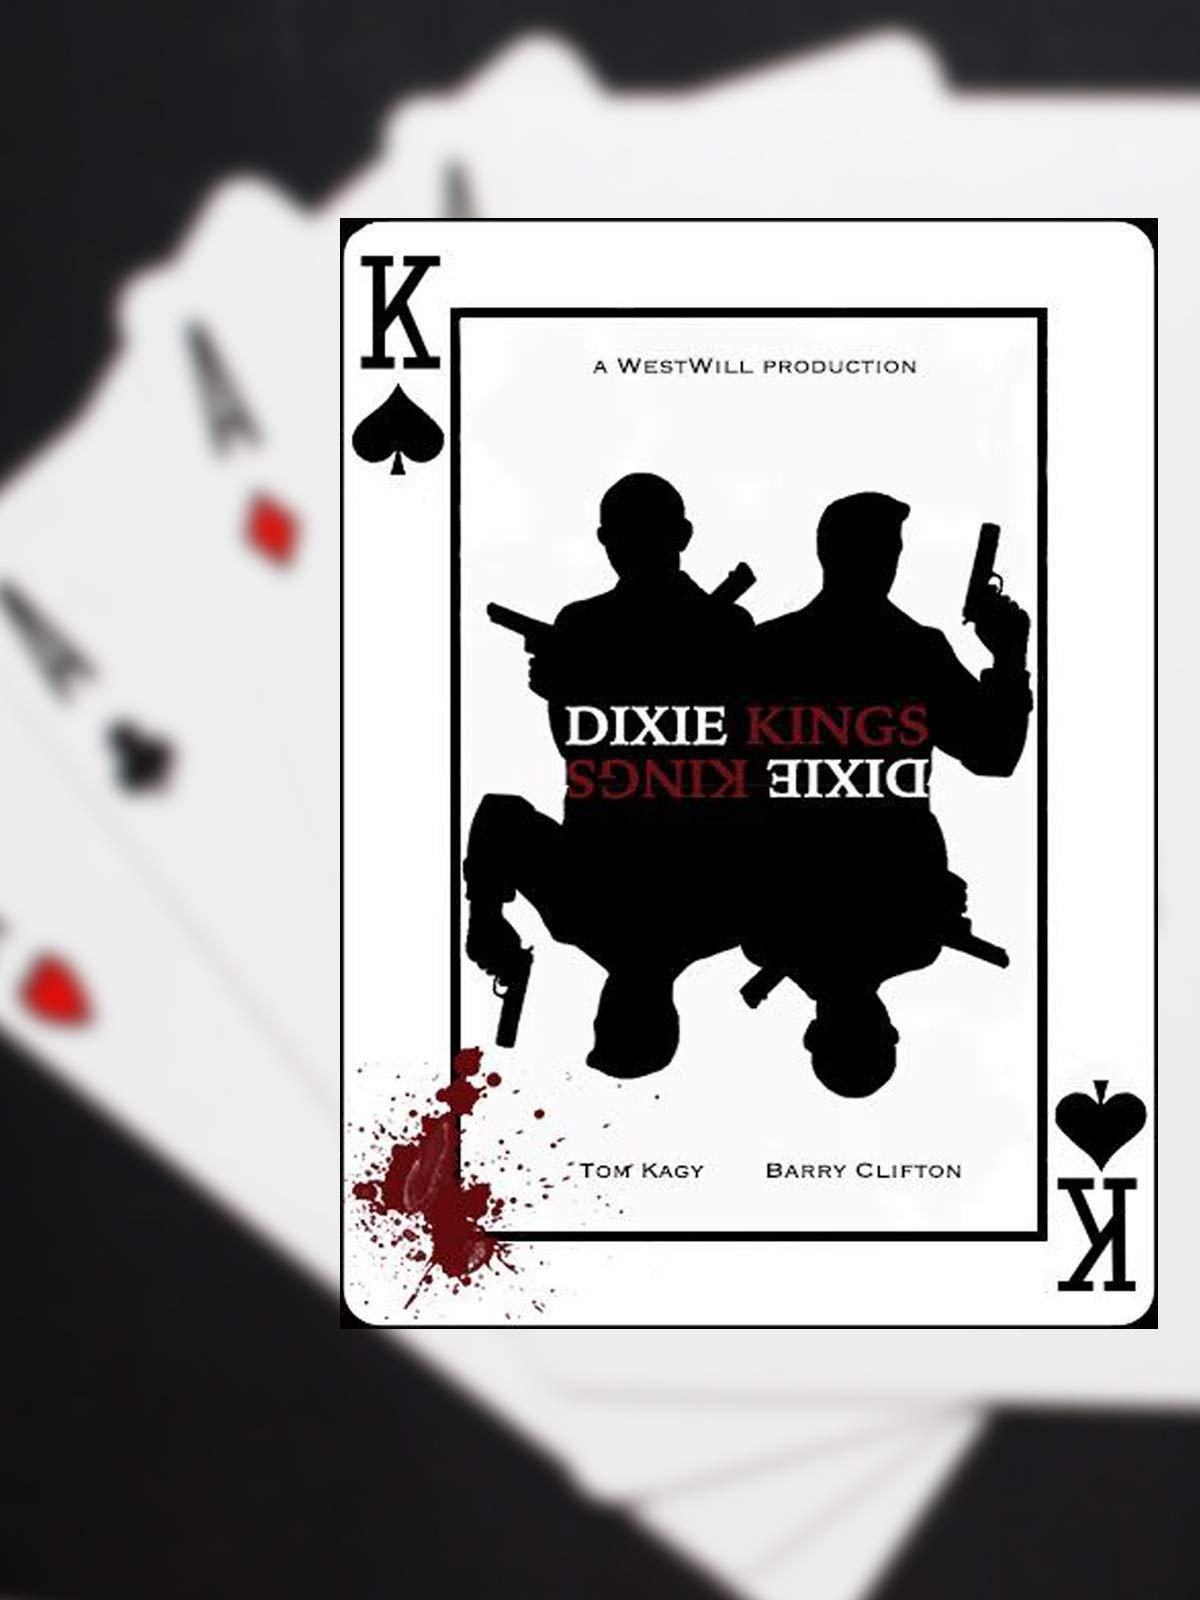 Dixie Kings